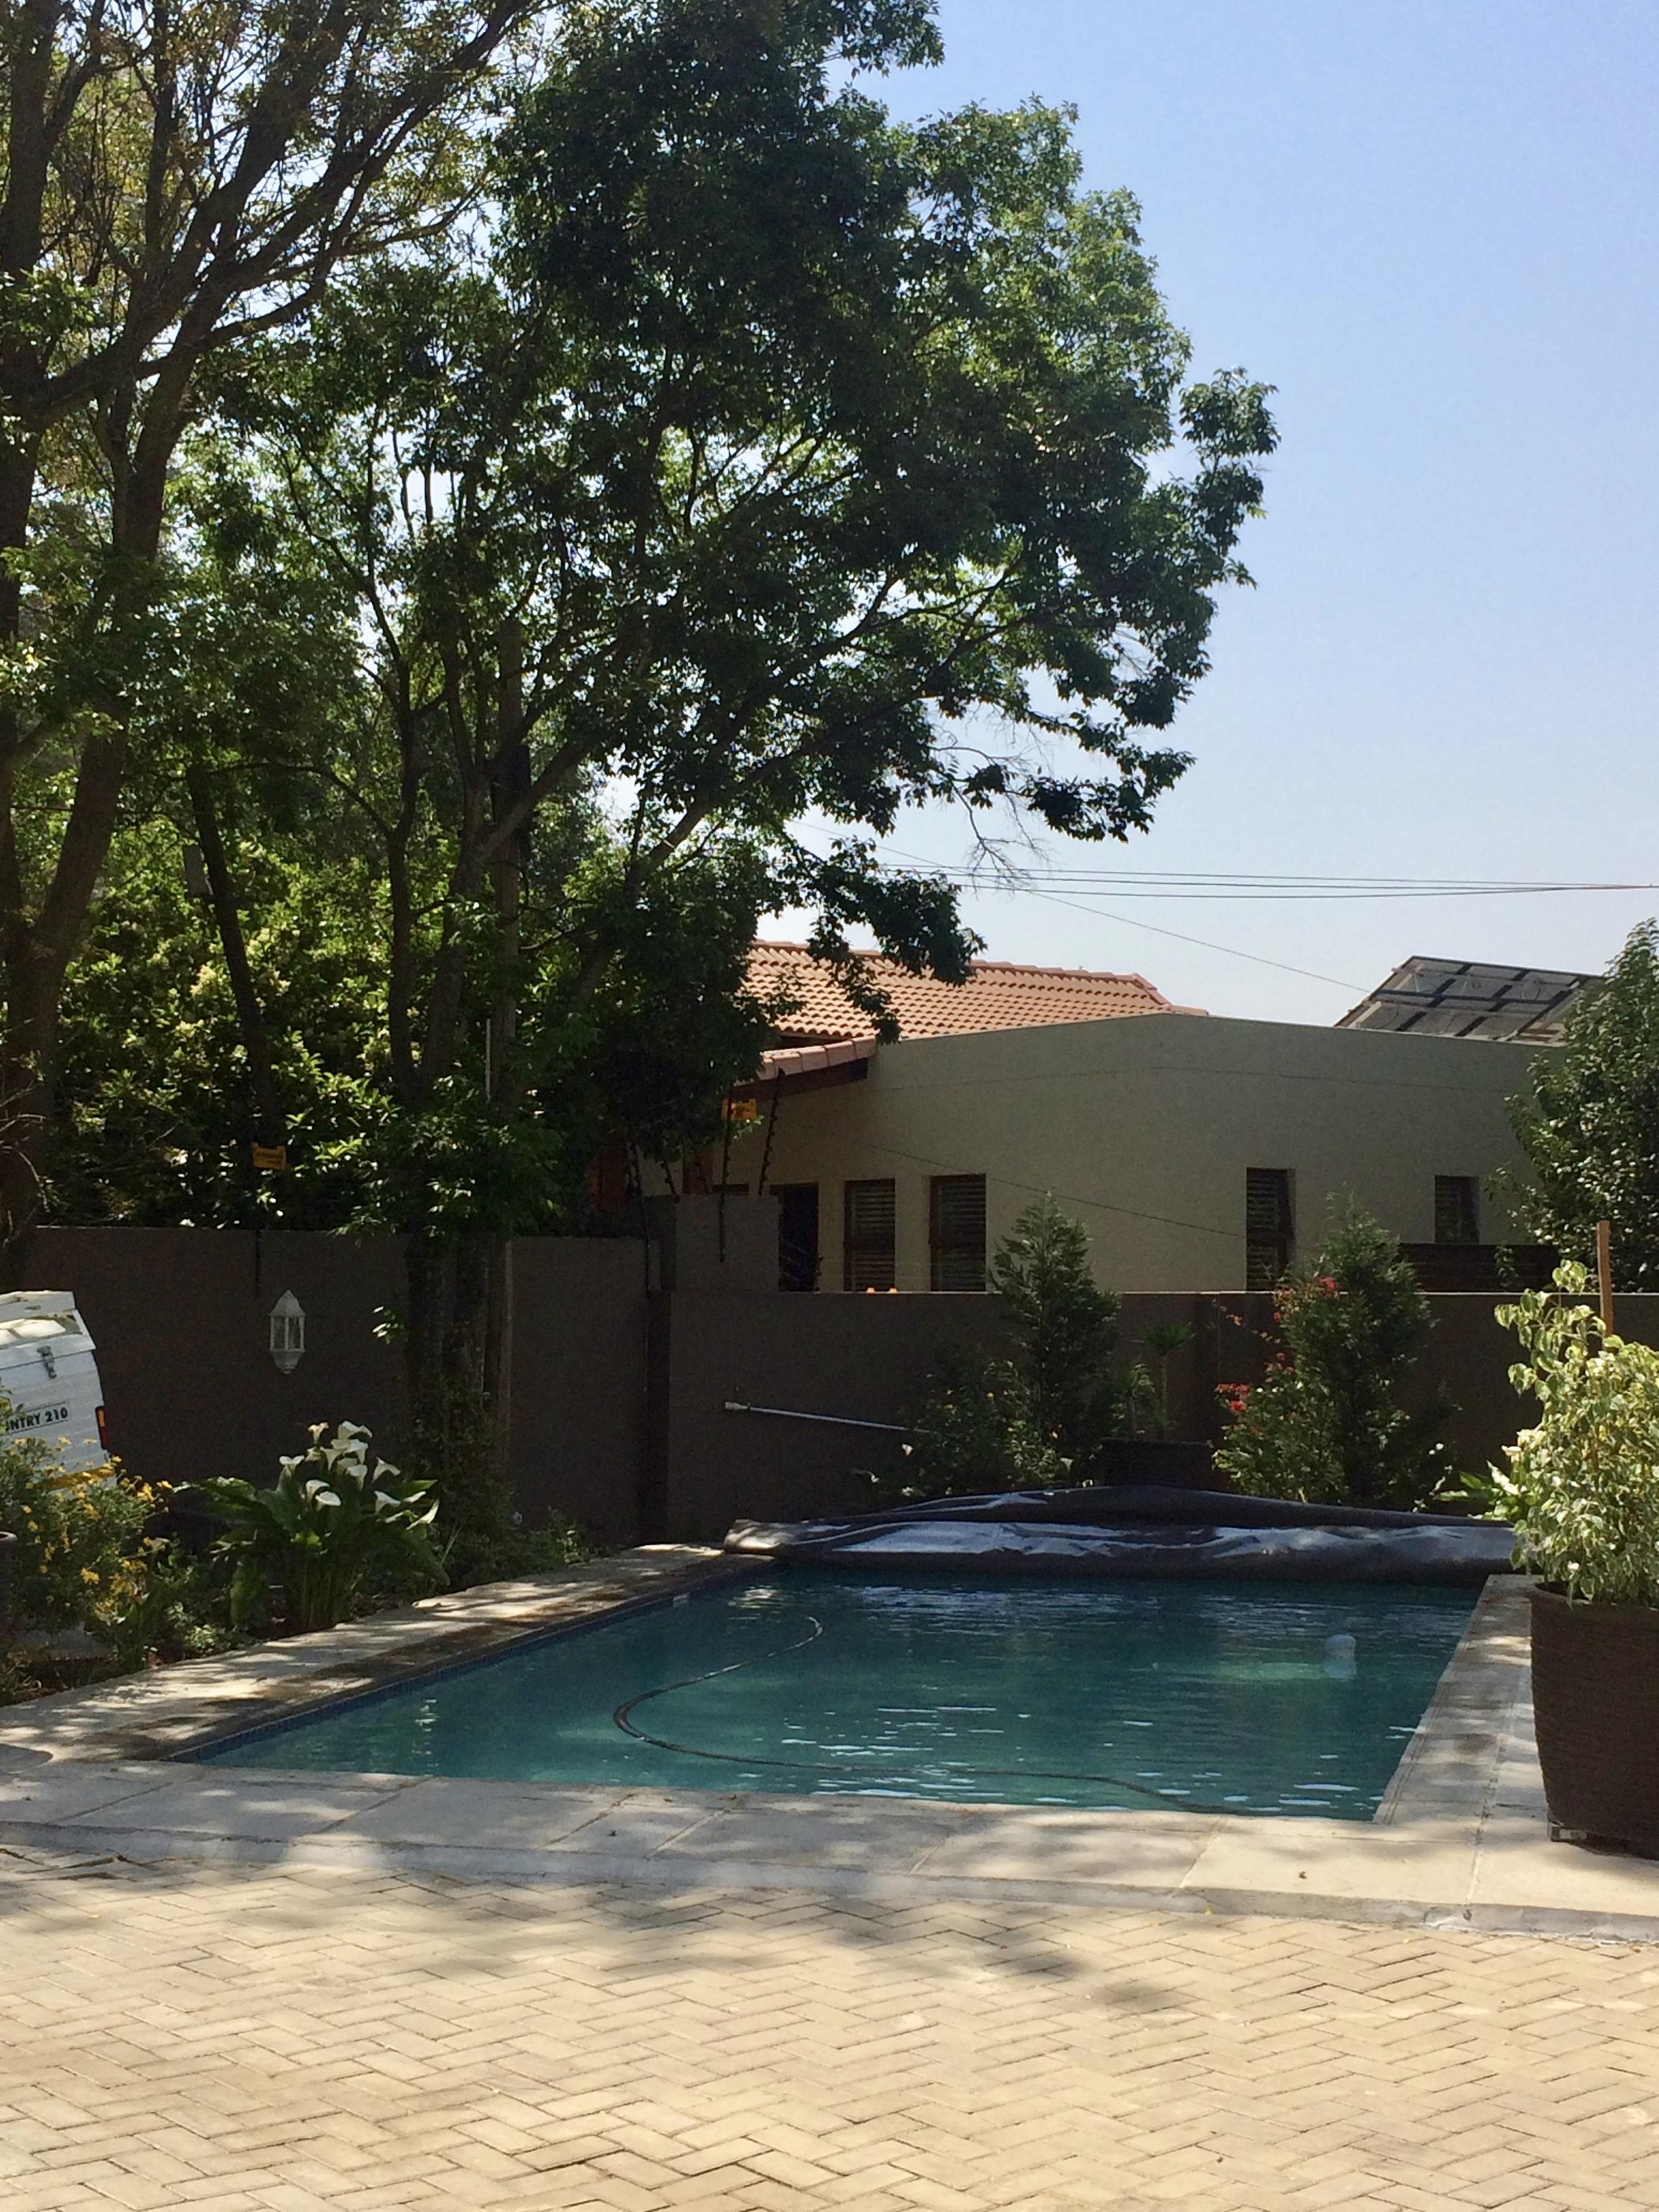 44 A 10th Avenue, Edenburg Rivonia Johannesburg, Gauteng, 4 Bedrooms Bedrooms, ,4 BathroomsBathrooms,House,For sale,10th Avenue,1039